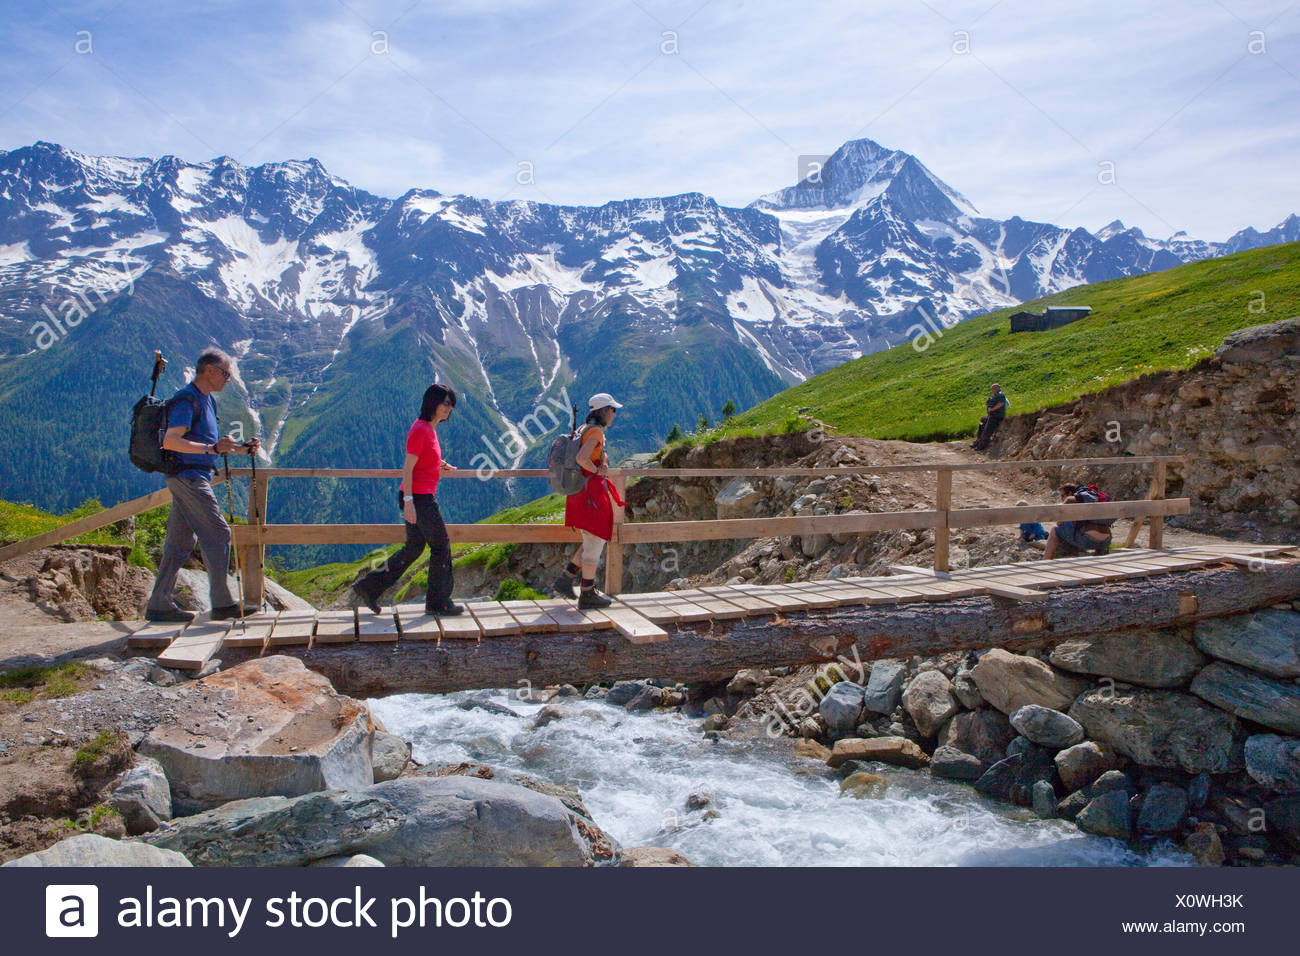 Walking, Hiking, Lötschentaler height way, height way, view, Bietschhorn, canton, Valais, mountain, mountains, group, footpath, - Stock Image